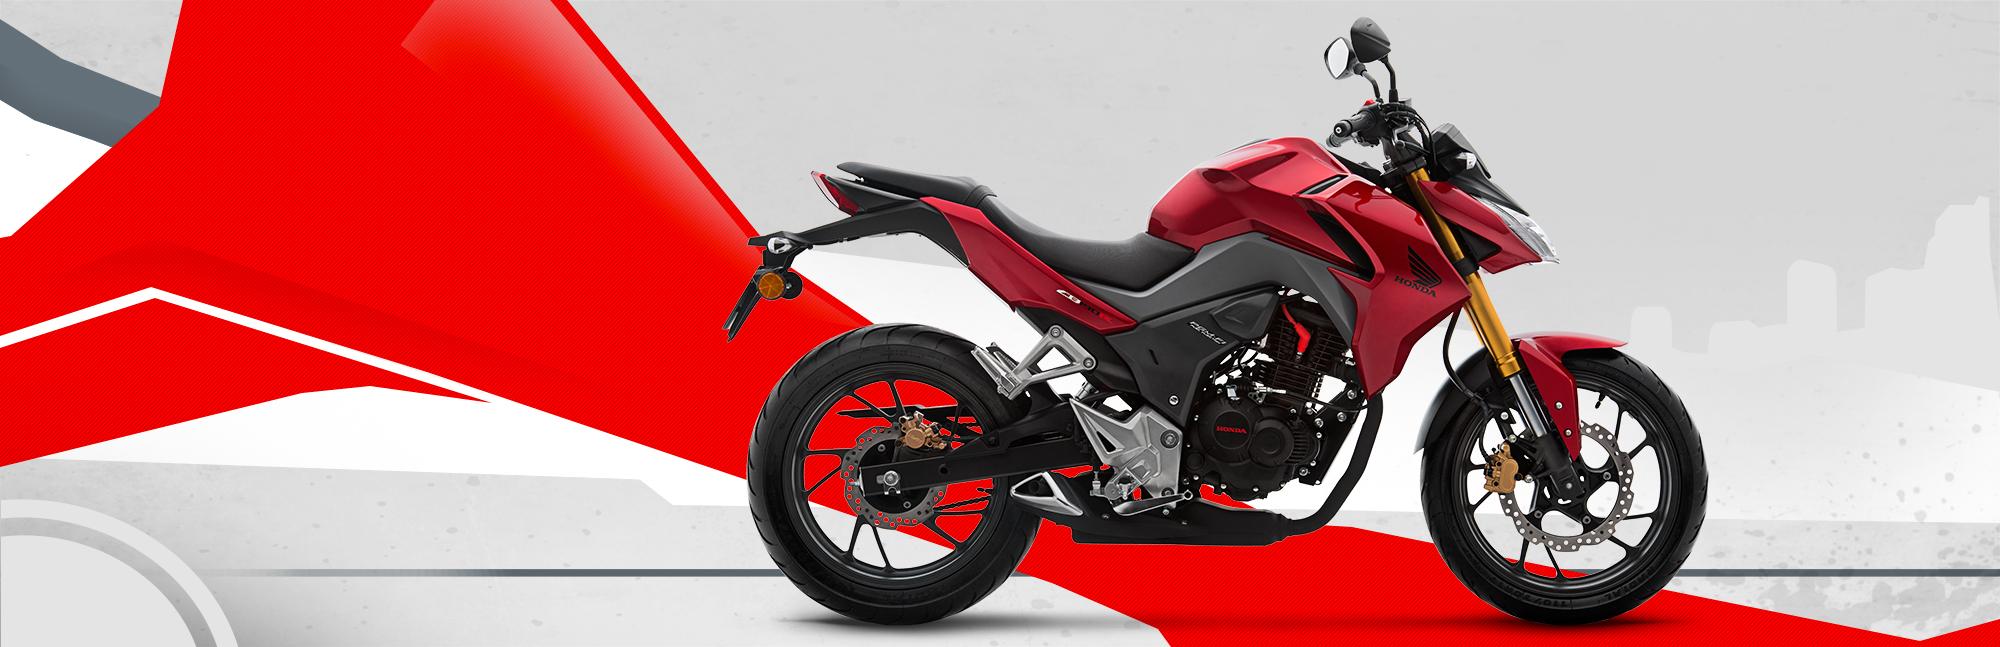 Motos Honda Costa Rica | CB190R - Motos Honda Costa Rica